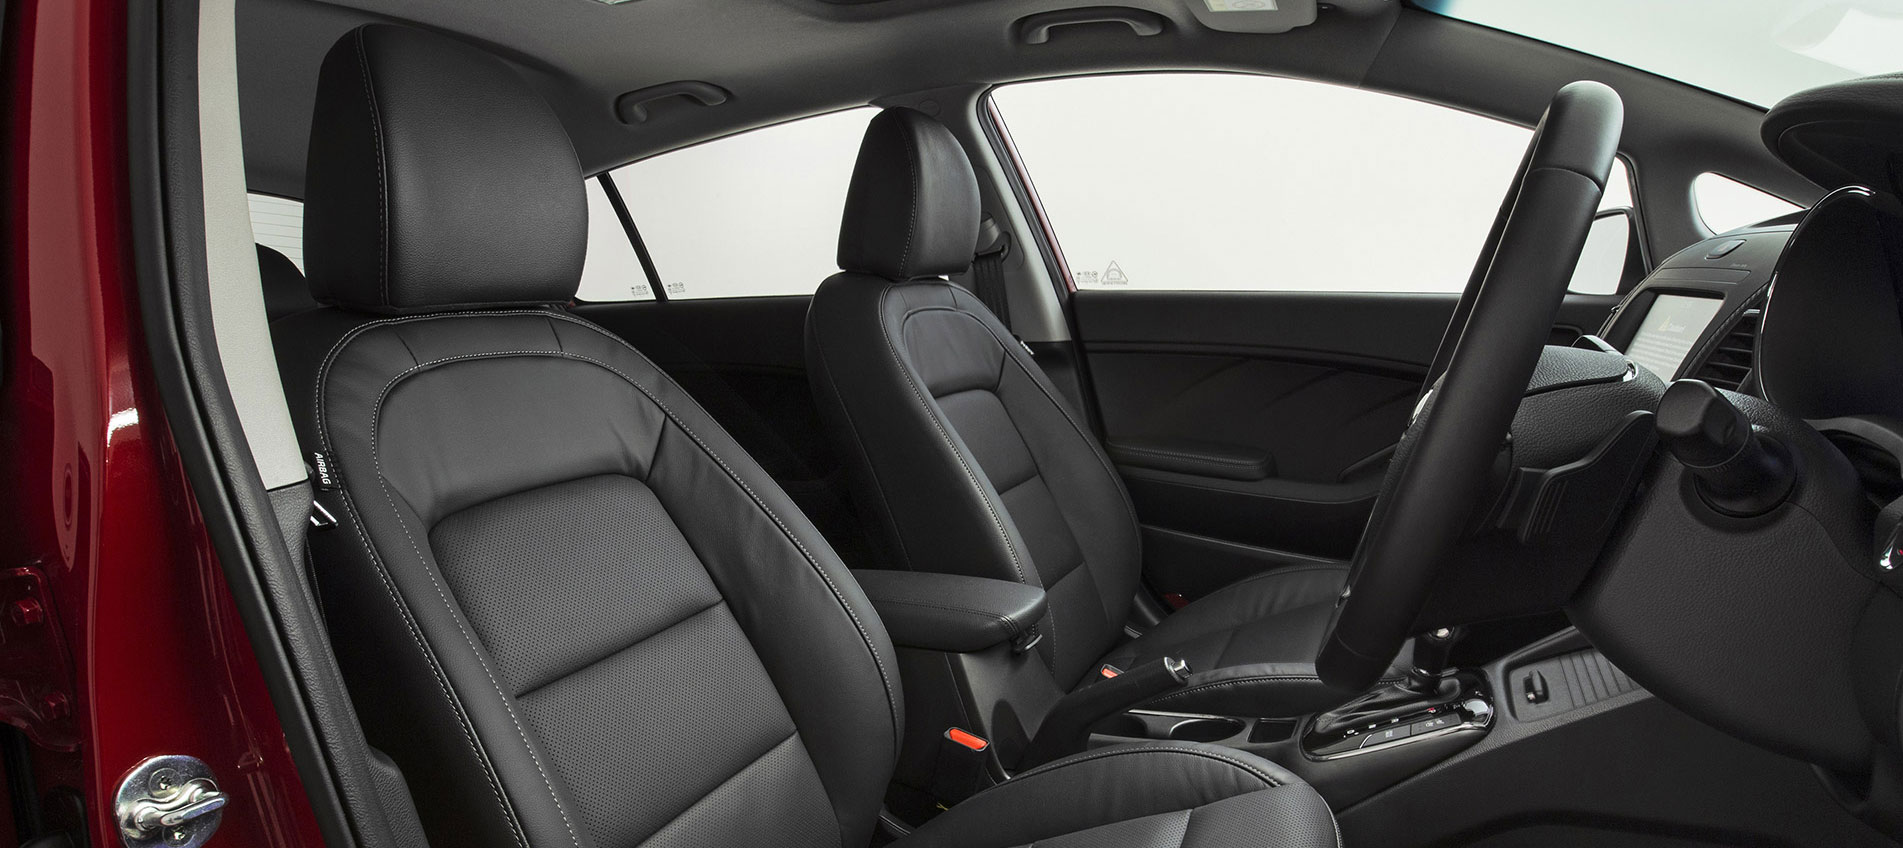 Kia Cerato Hatch Image 3